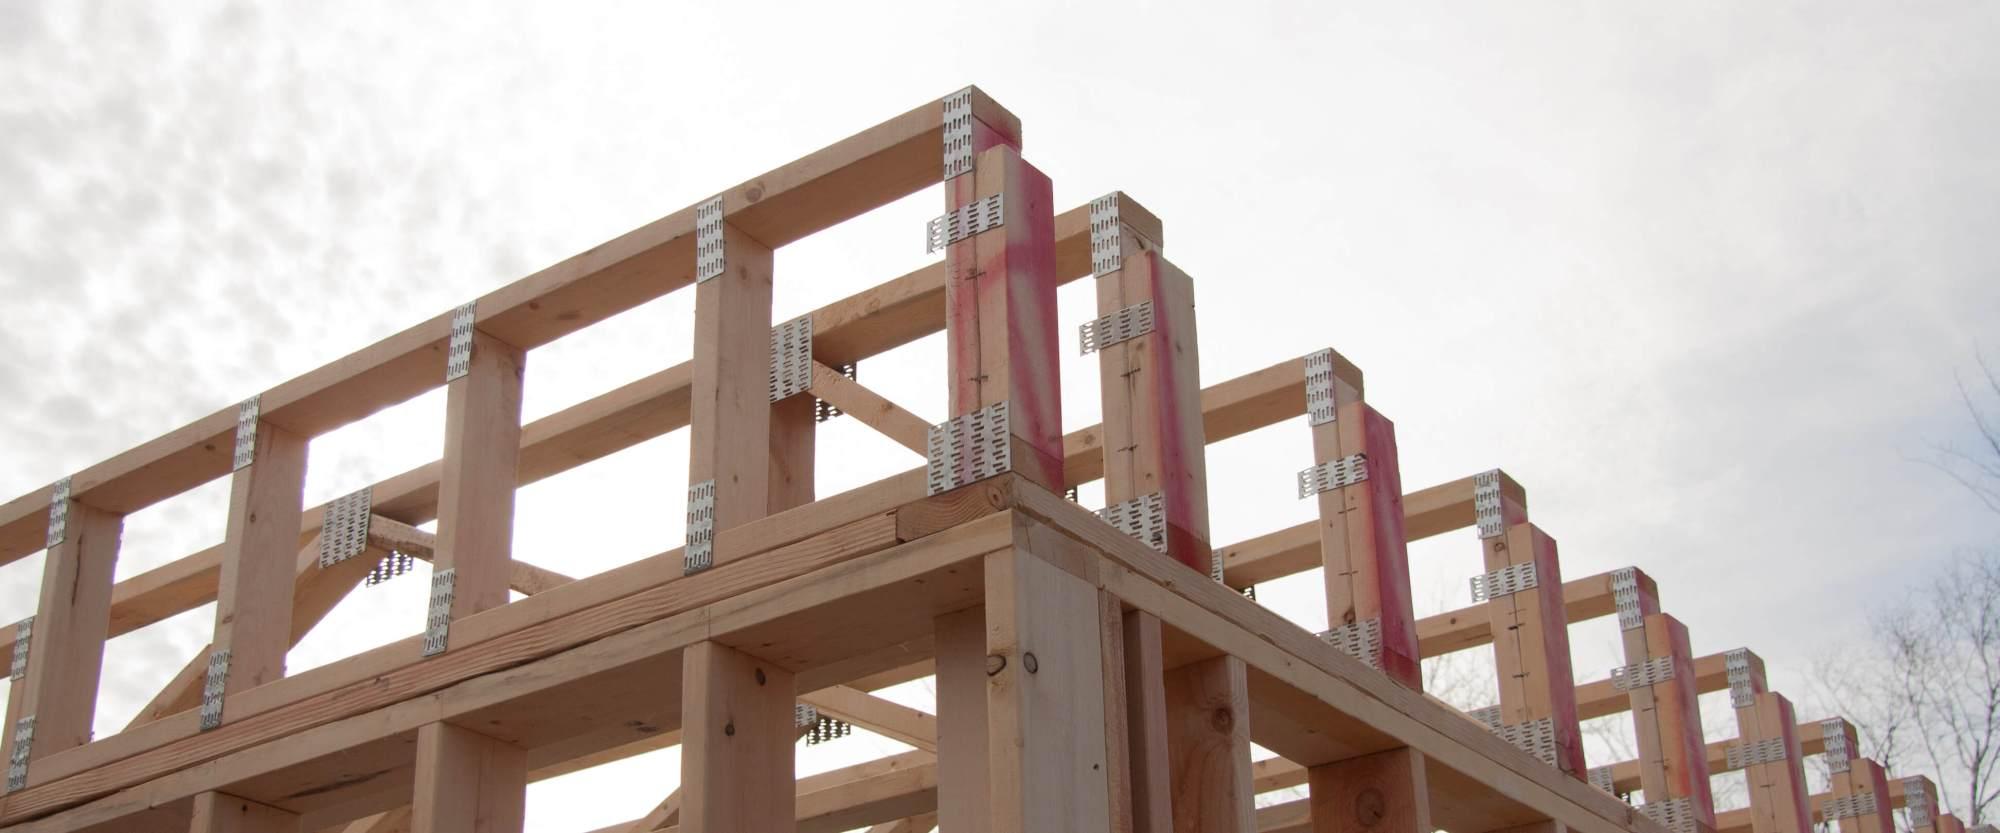 hight resolution of trusses floor scene